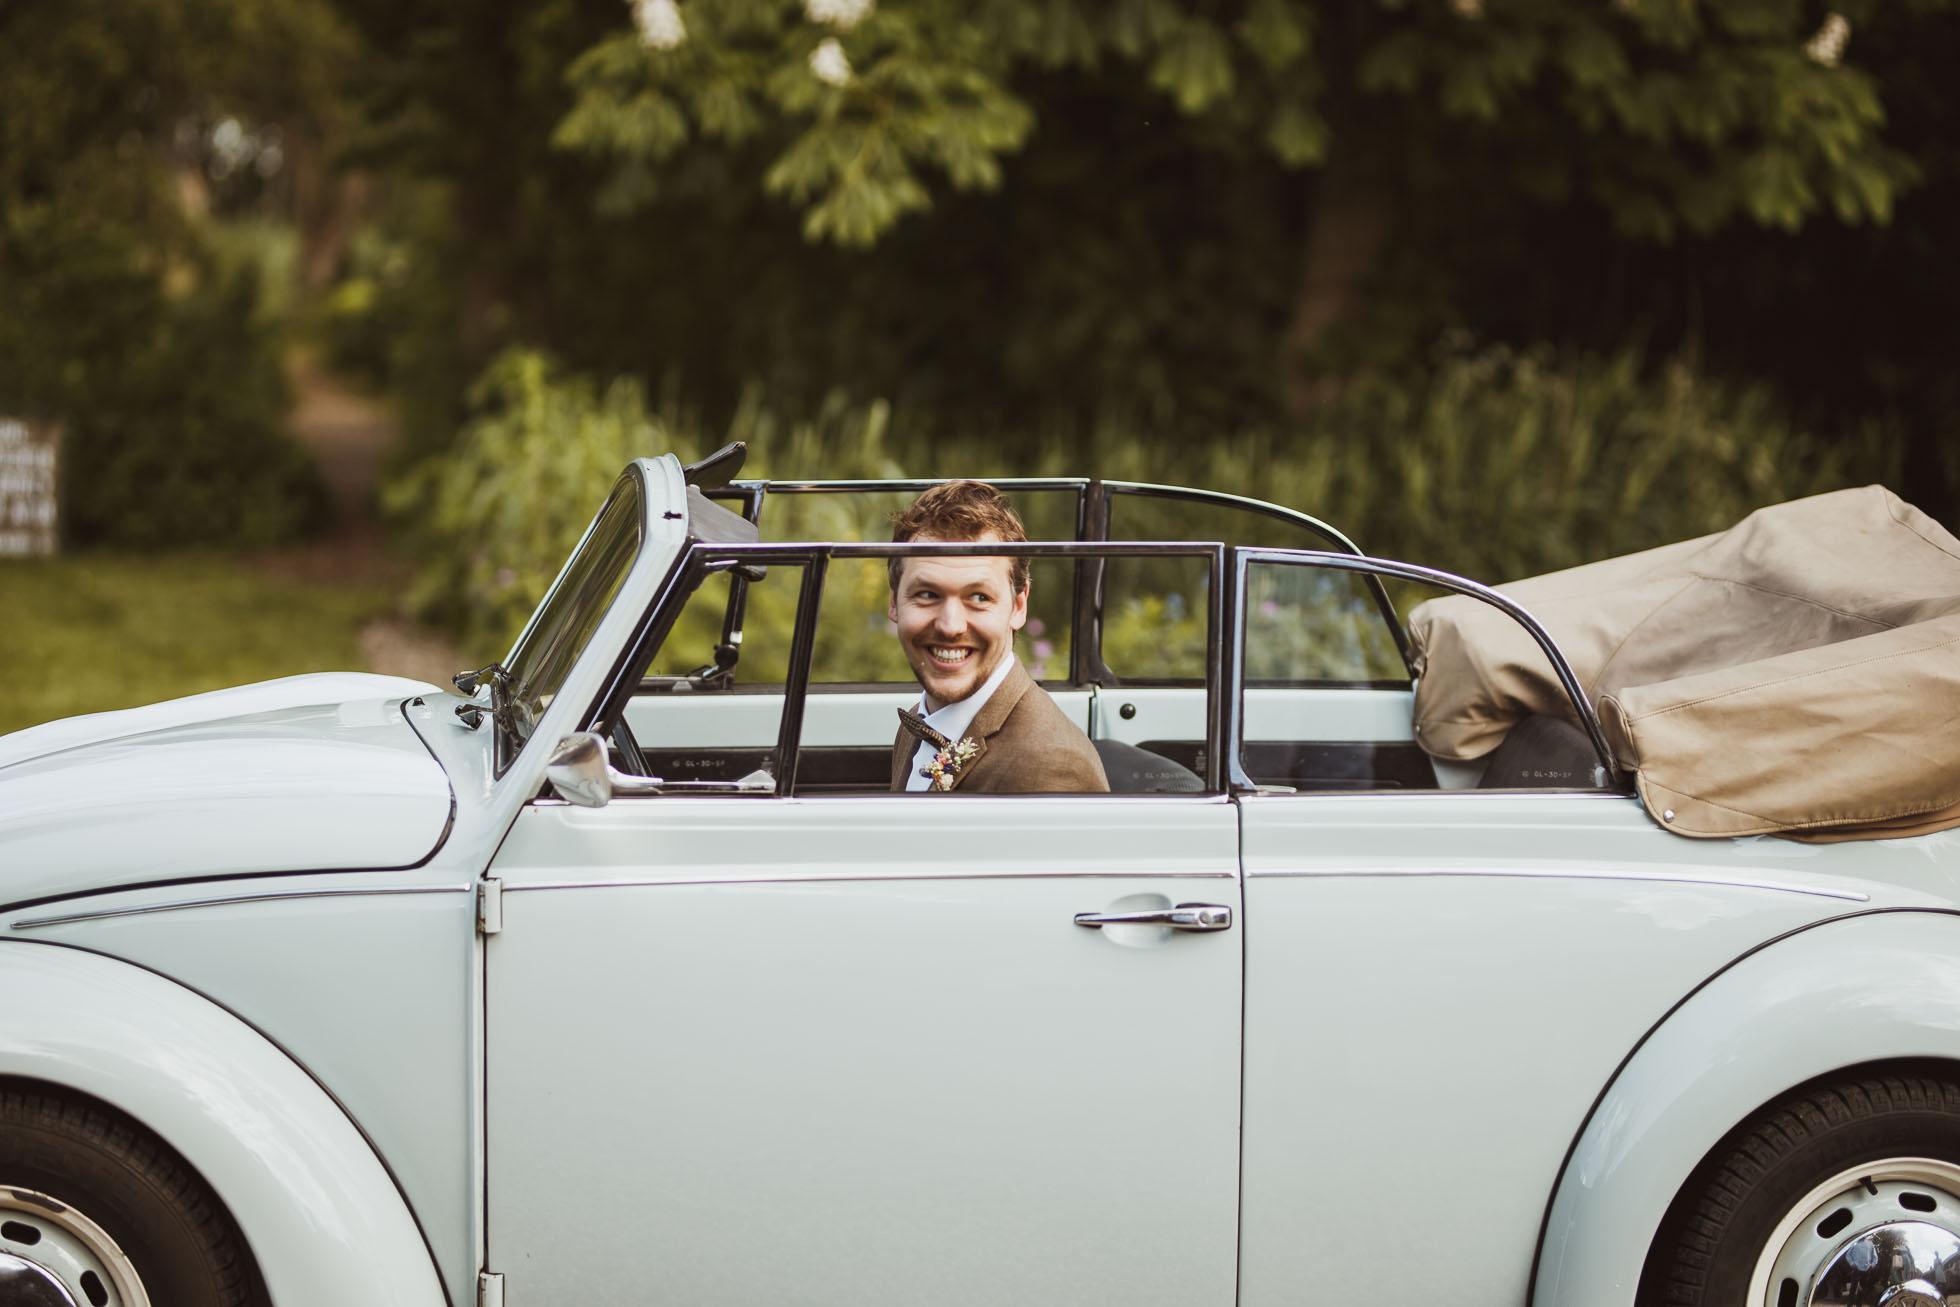 utrecht-wedding-photographer-34.jpg